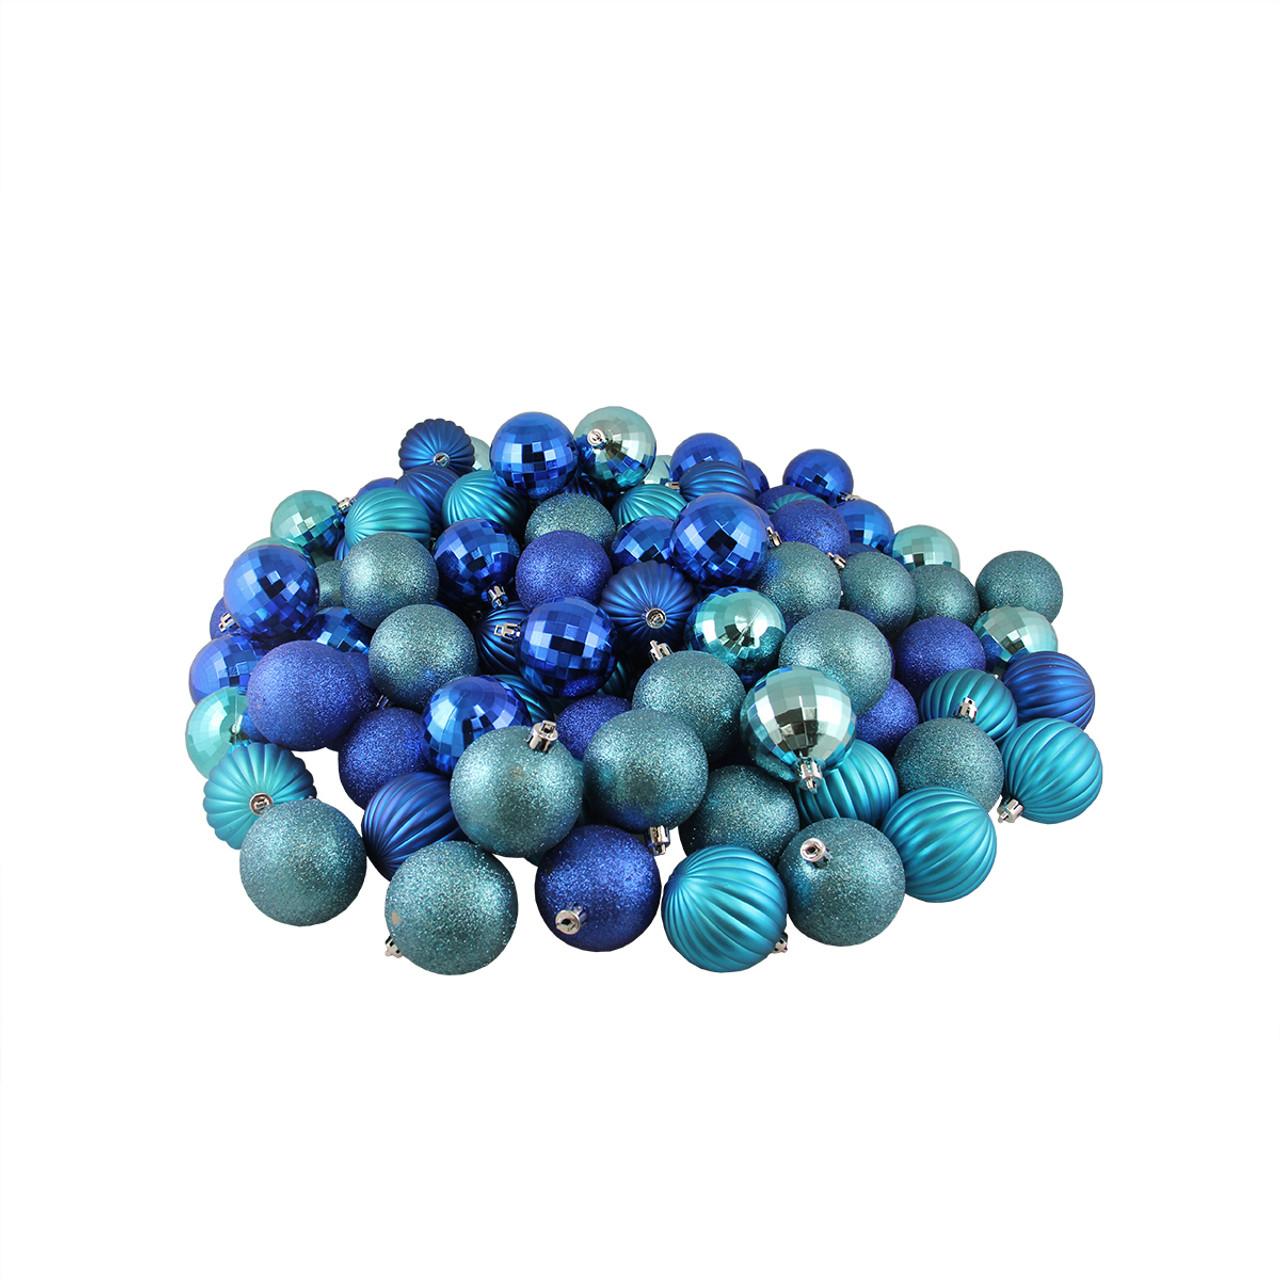 100ct Peacock Blue 3-Finish Shatterproof Christmas Ball ...